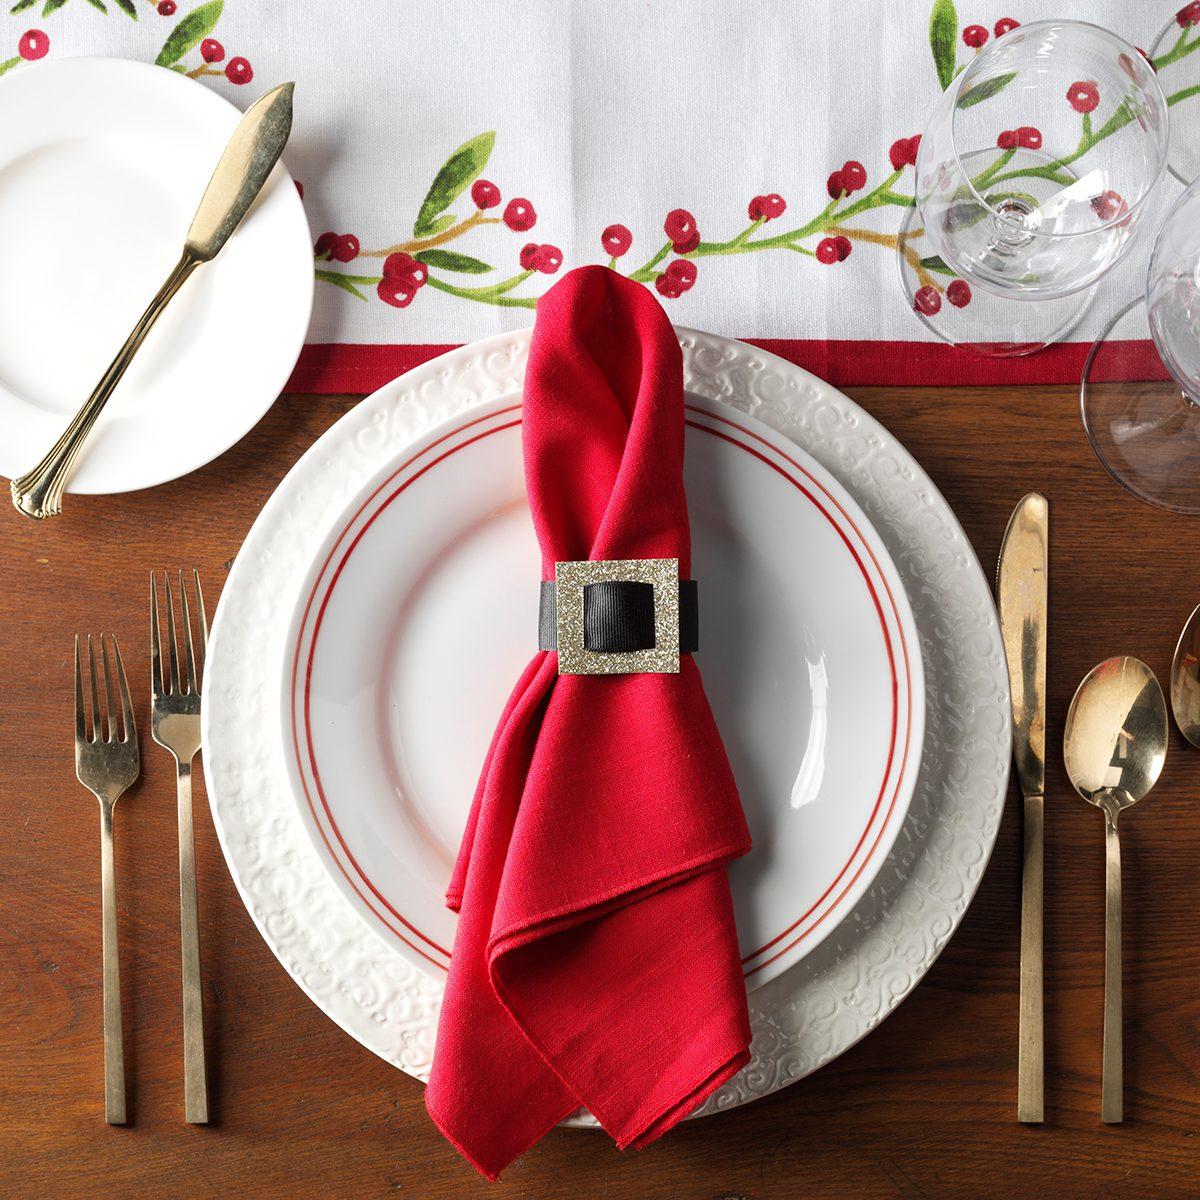 Santa table setting